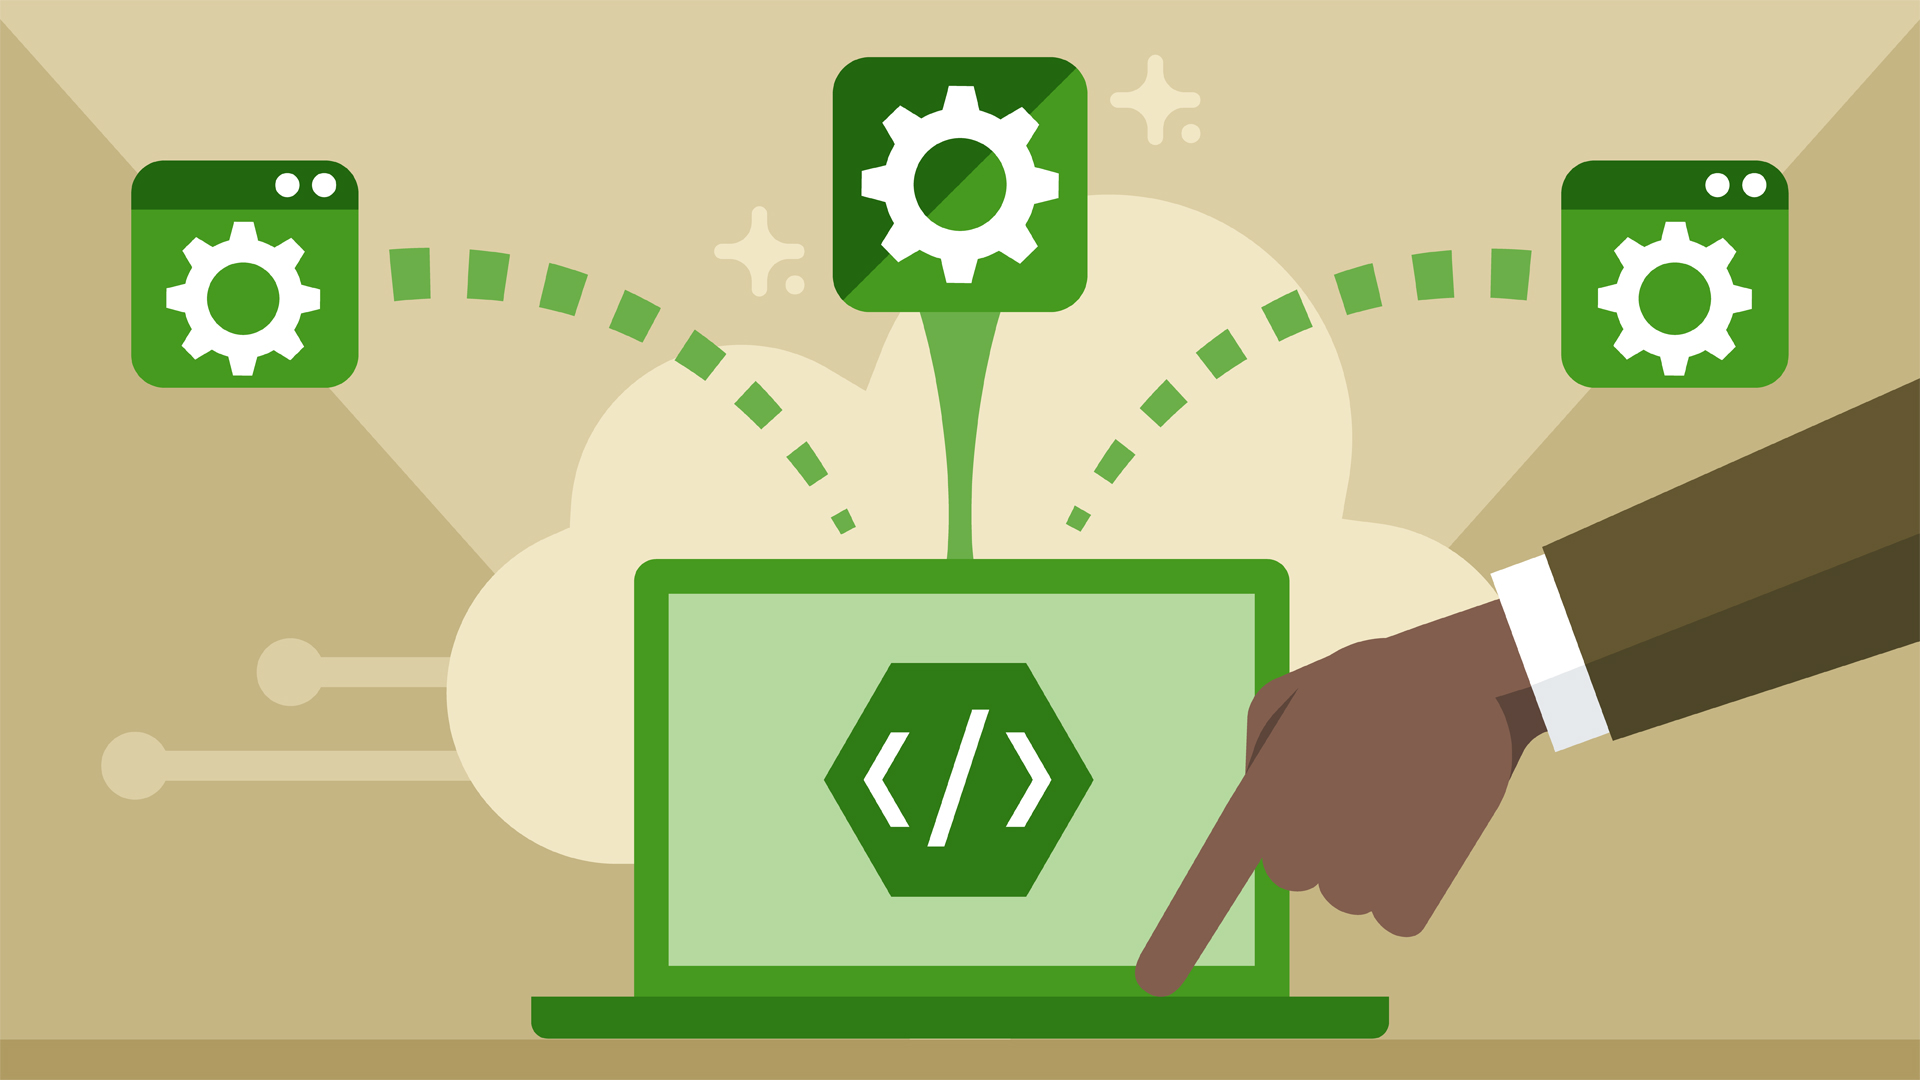 Node js: Deploying Applications